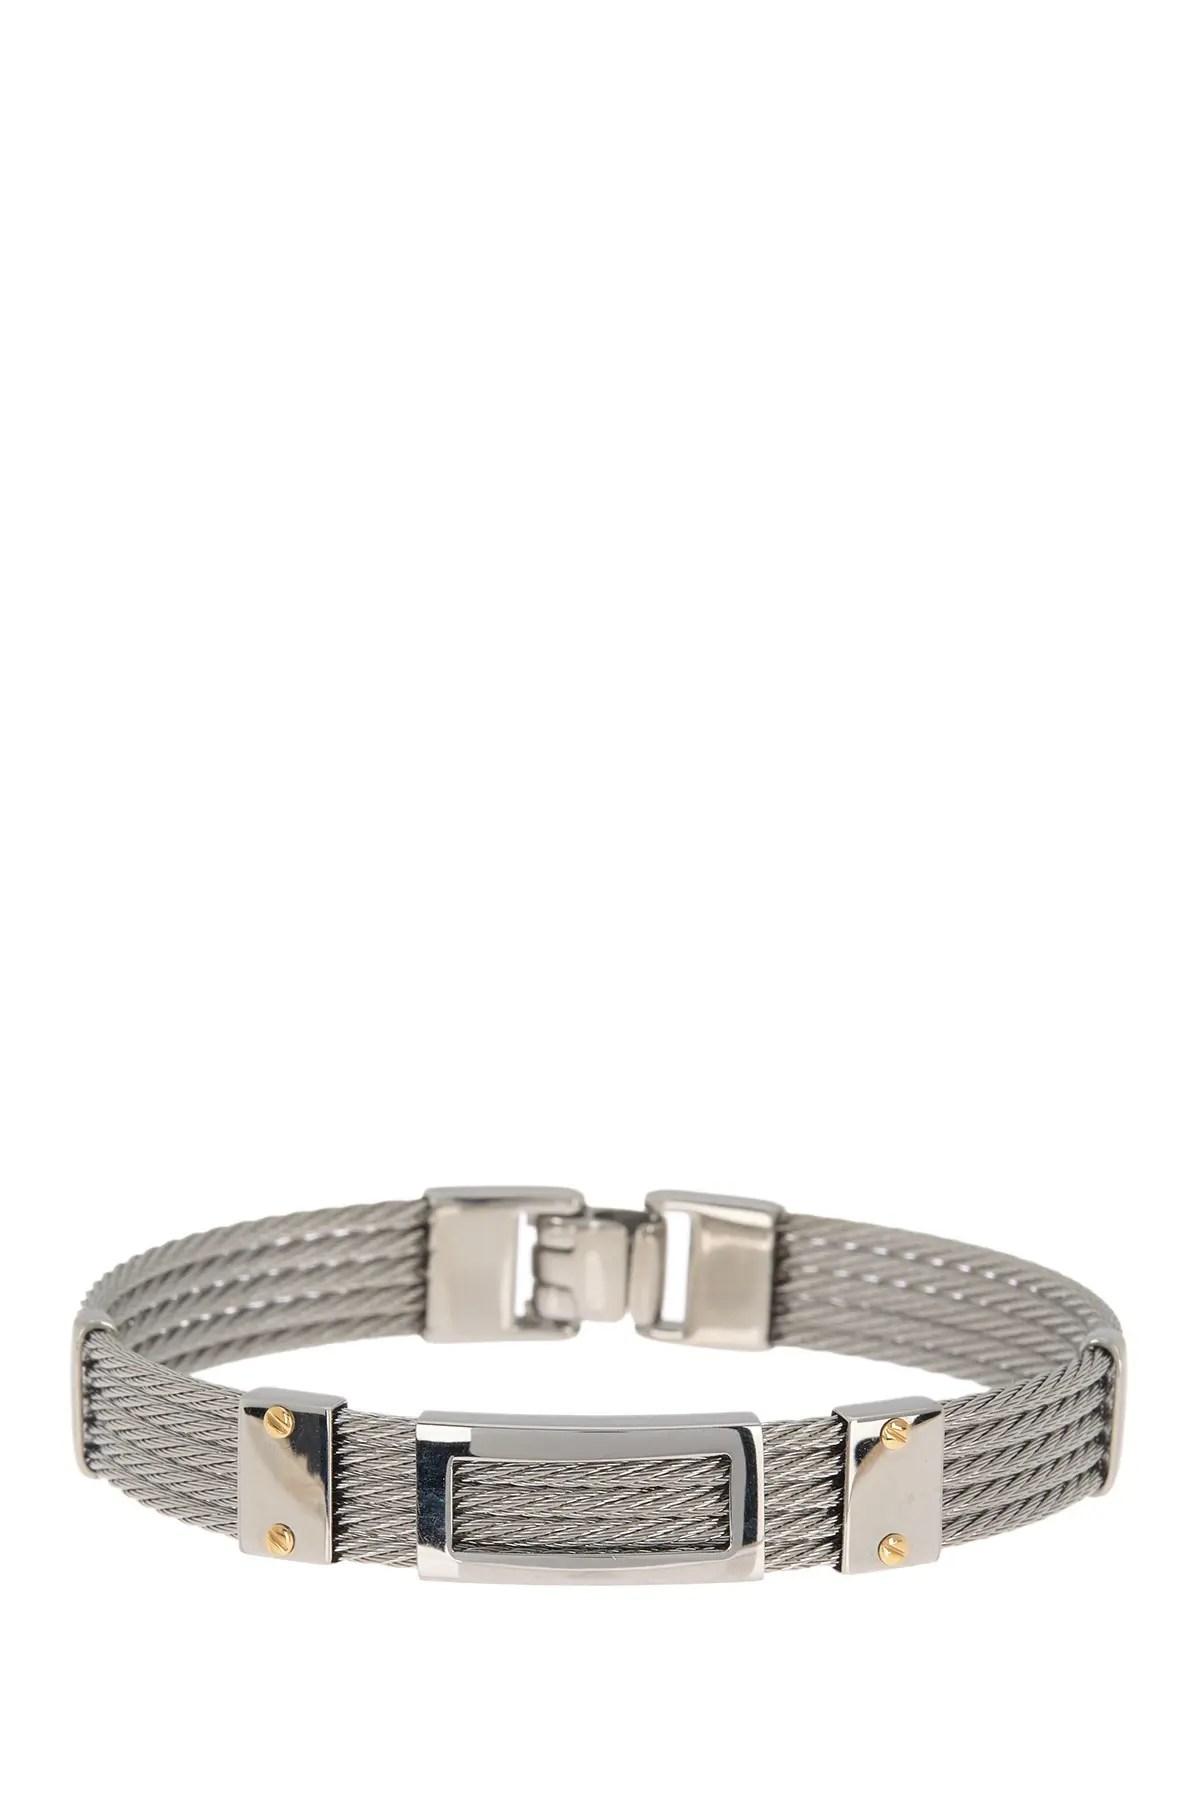 fine jewelry bracelets nordstrom rack